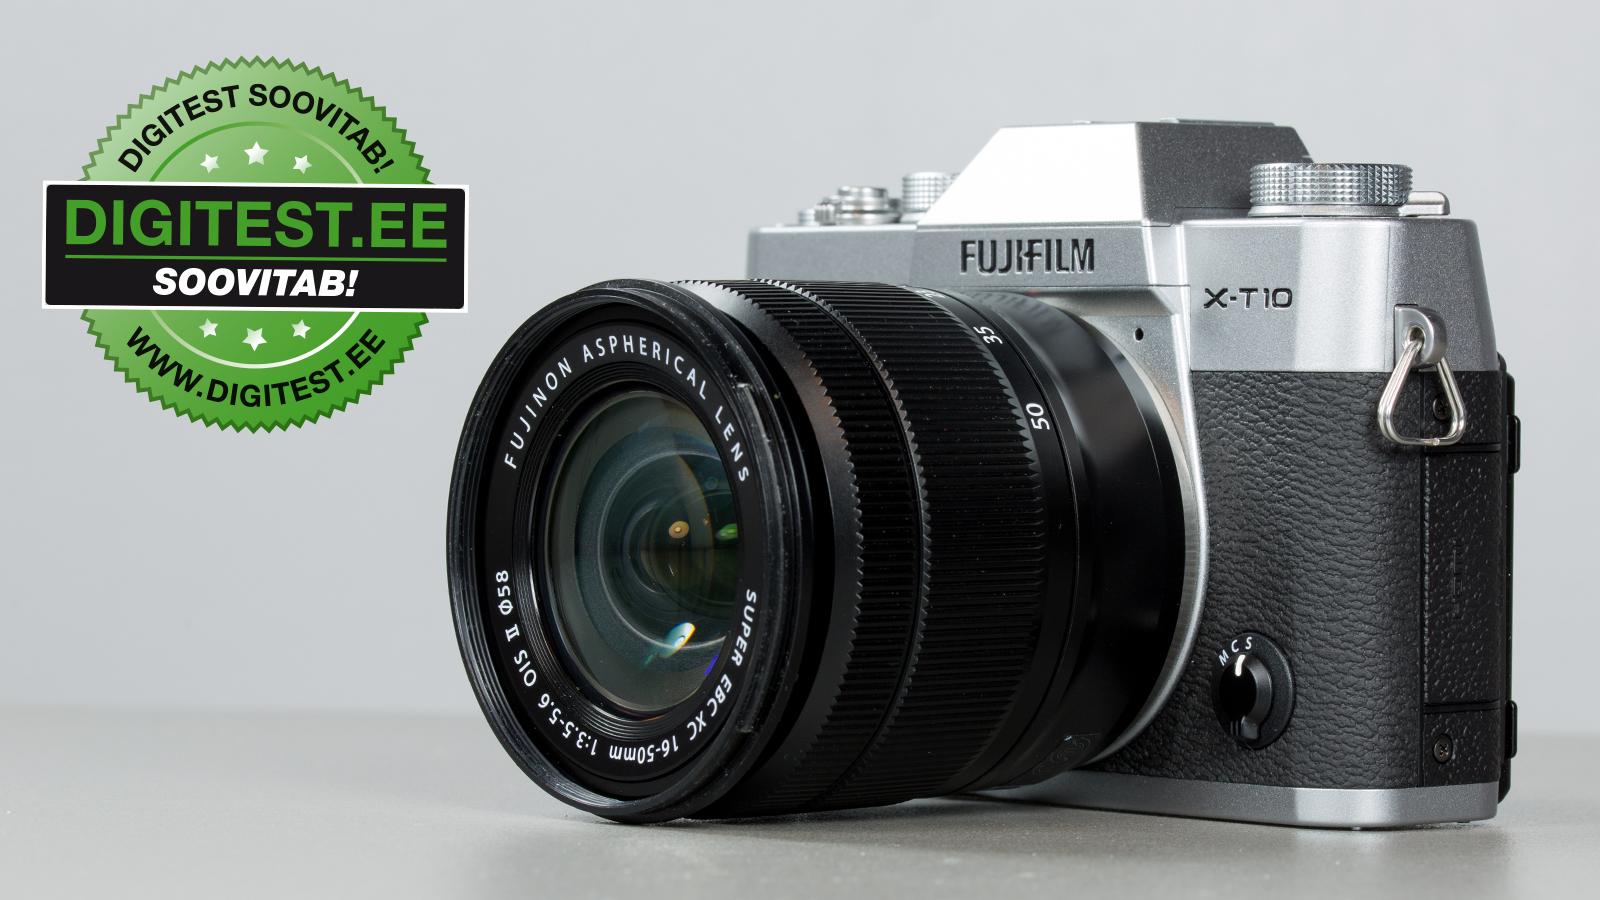 Fujifilm-X-T10-DT-025-lopp